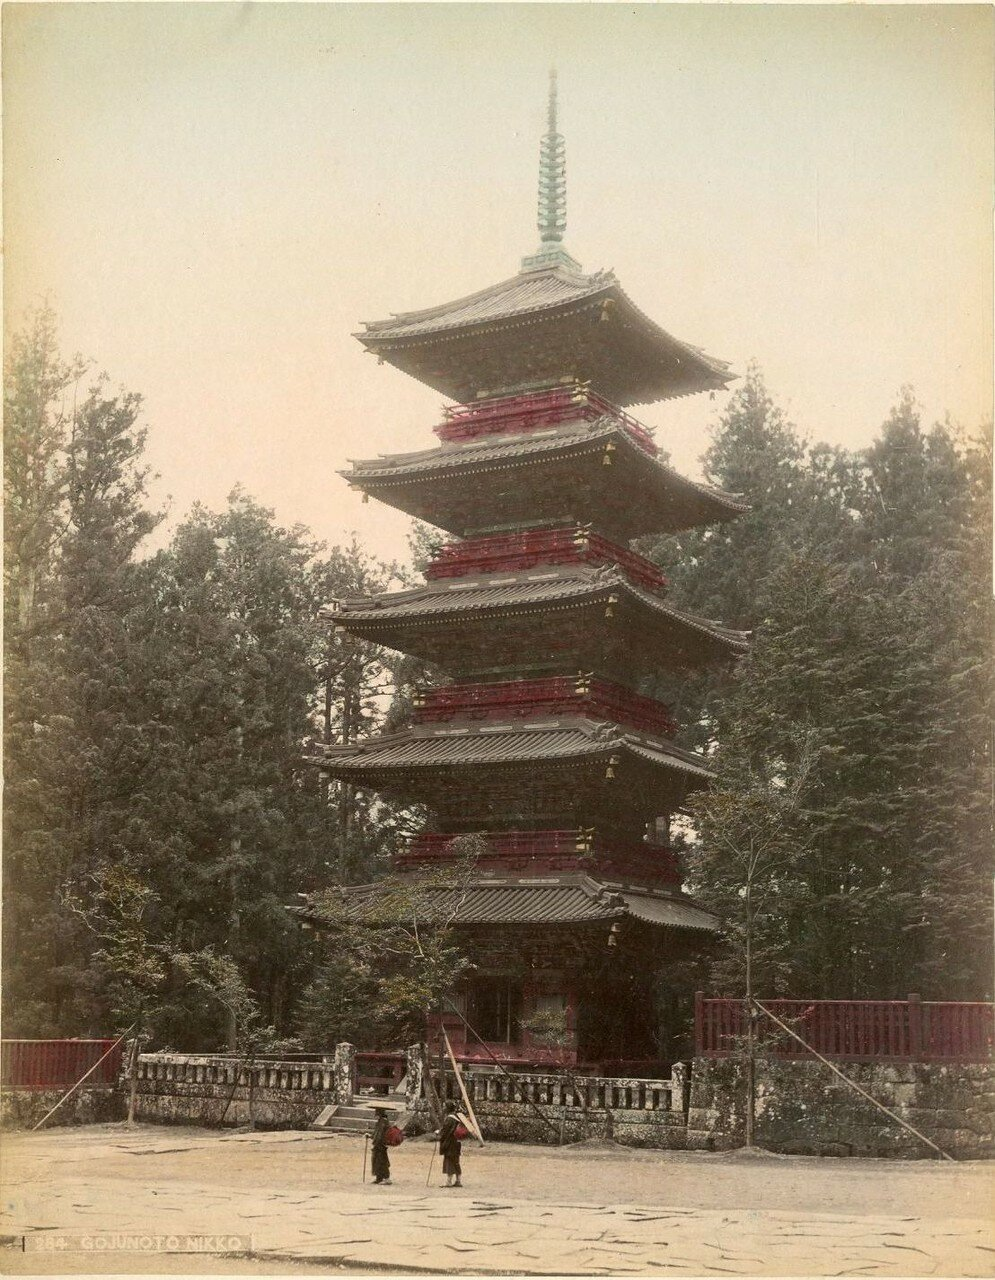 Никко. Пятиэтажная пагода